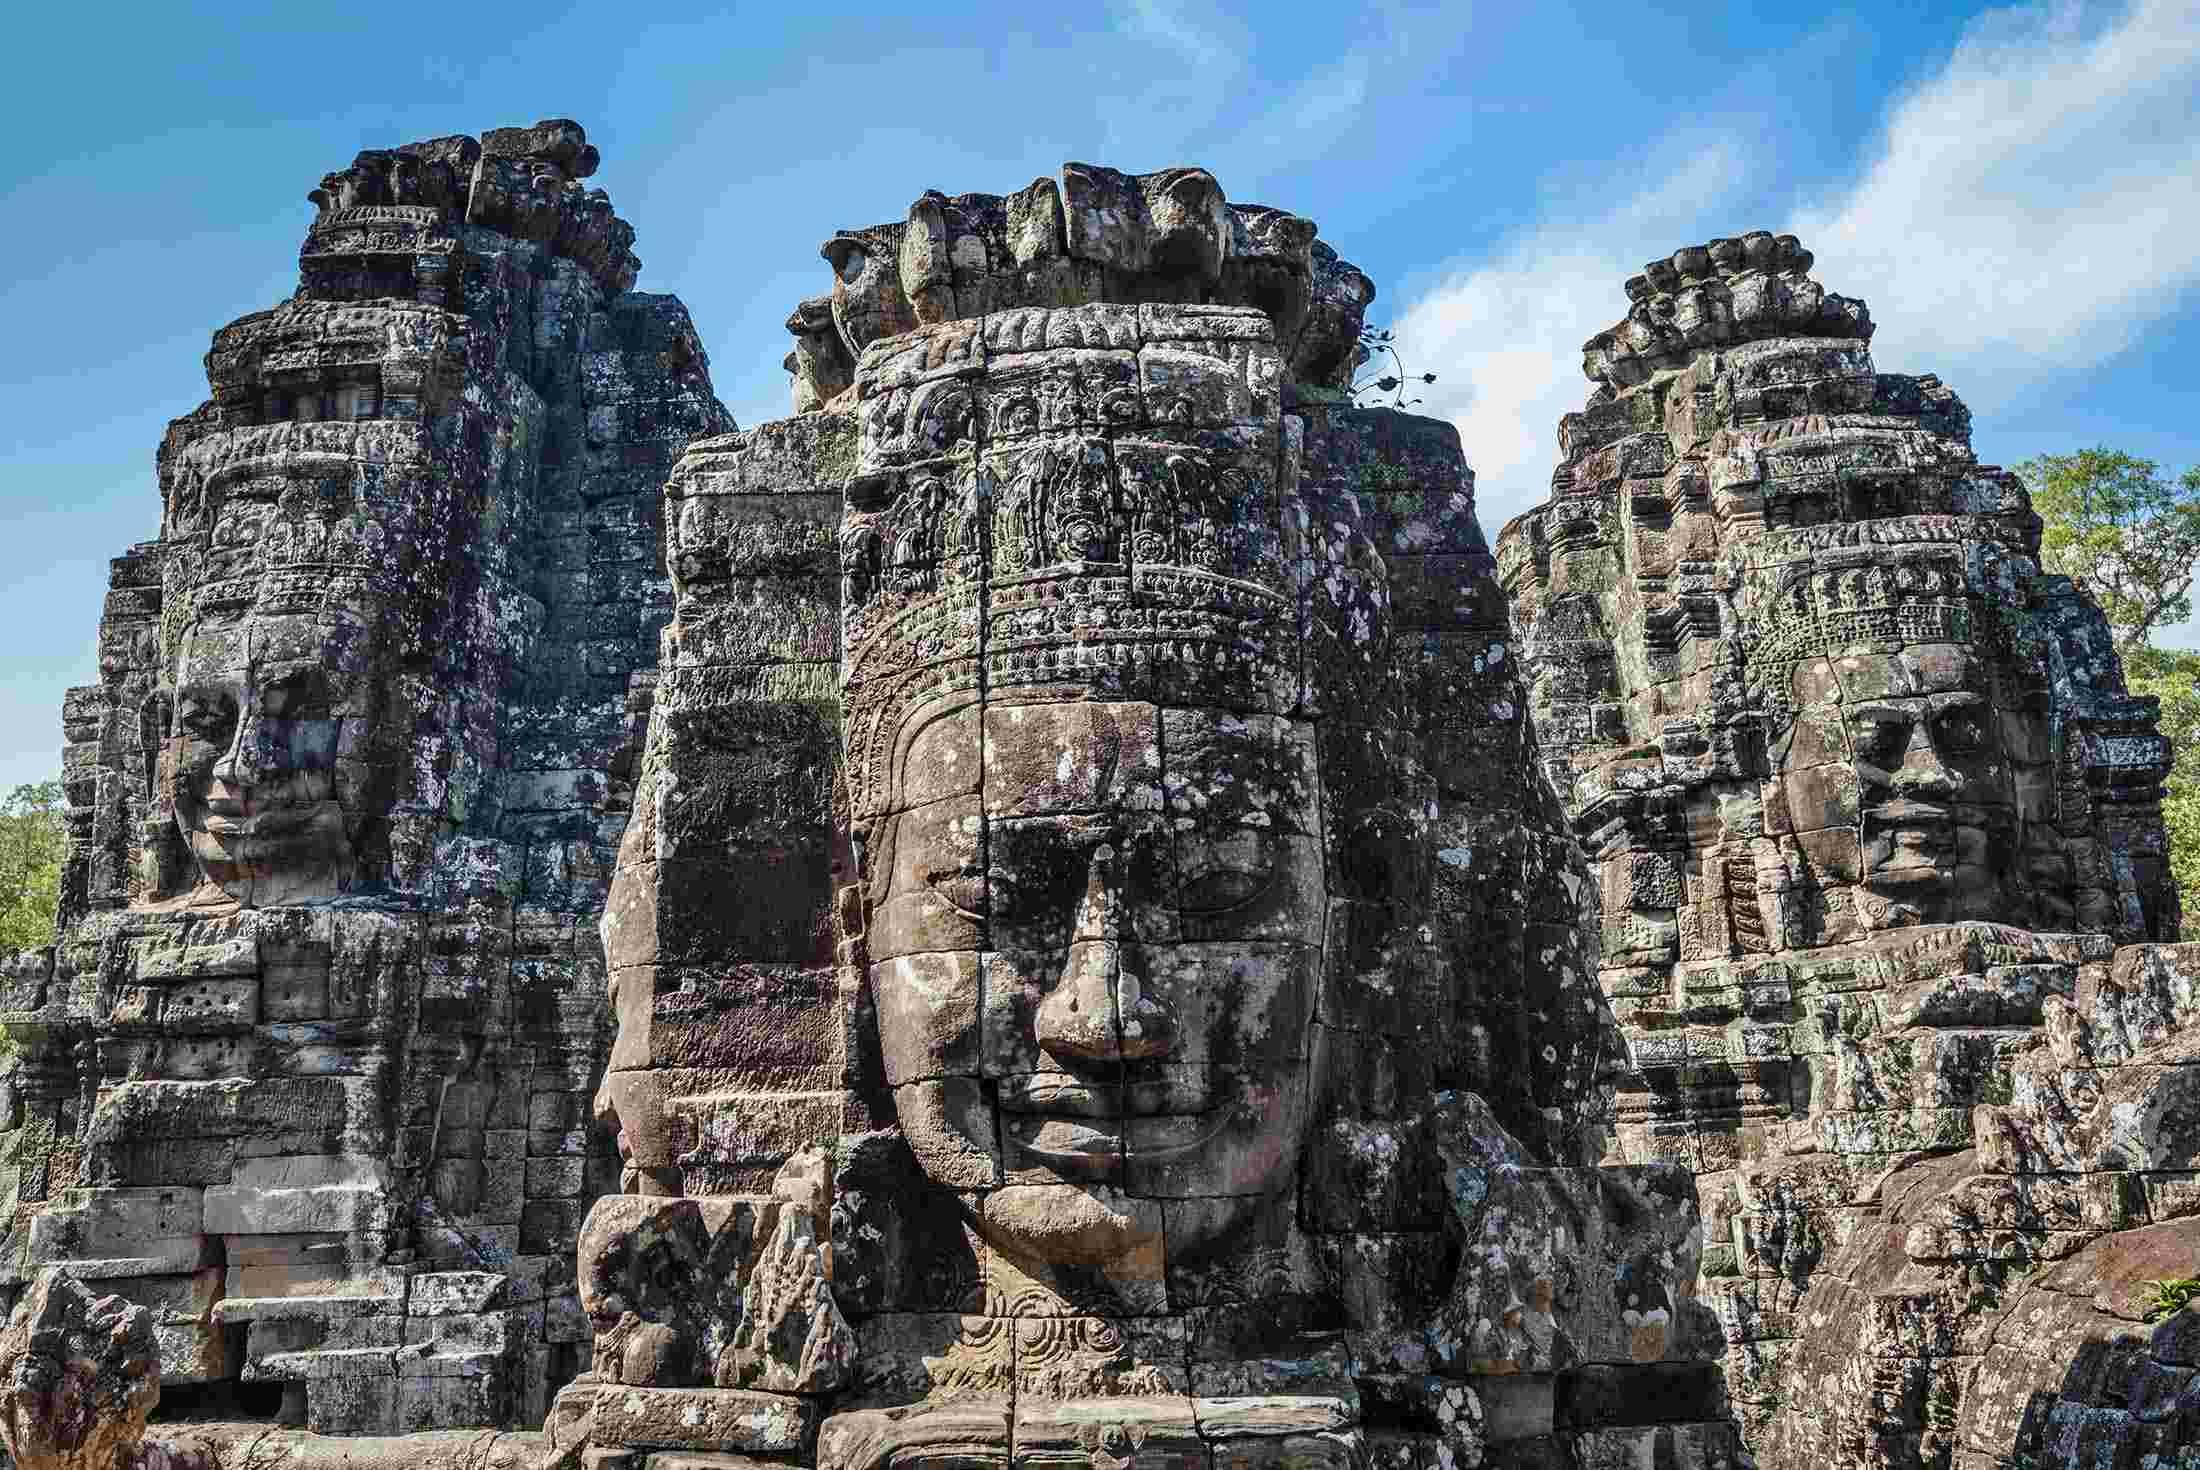 Siem Reap & The Khmer Legacy, Angkor Thom